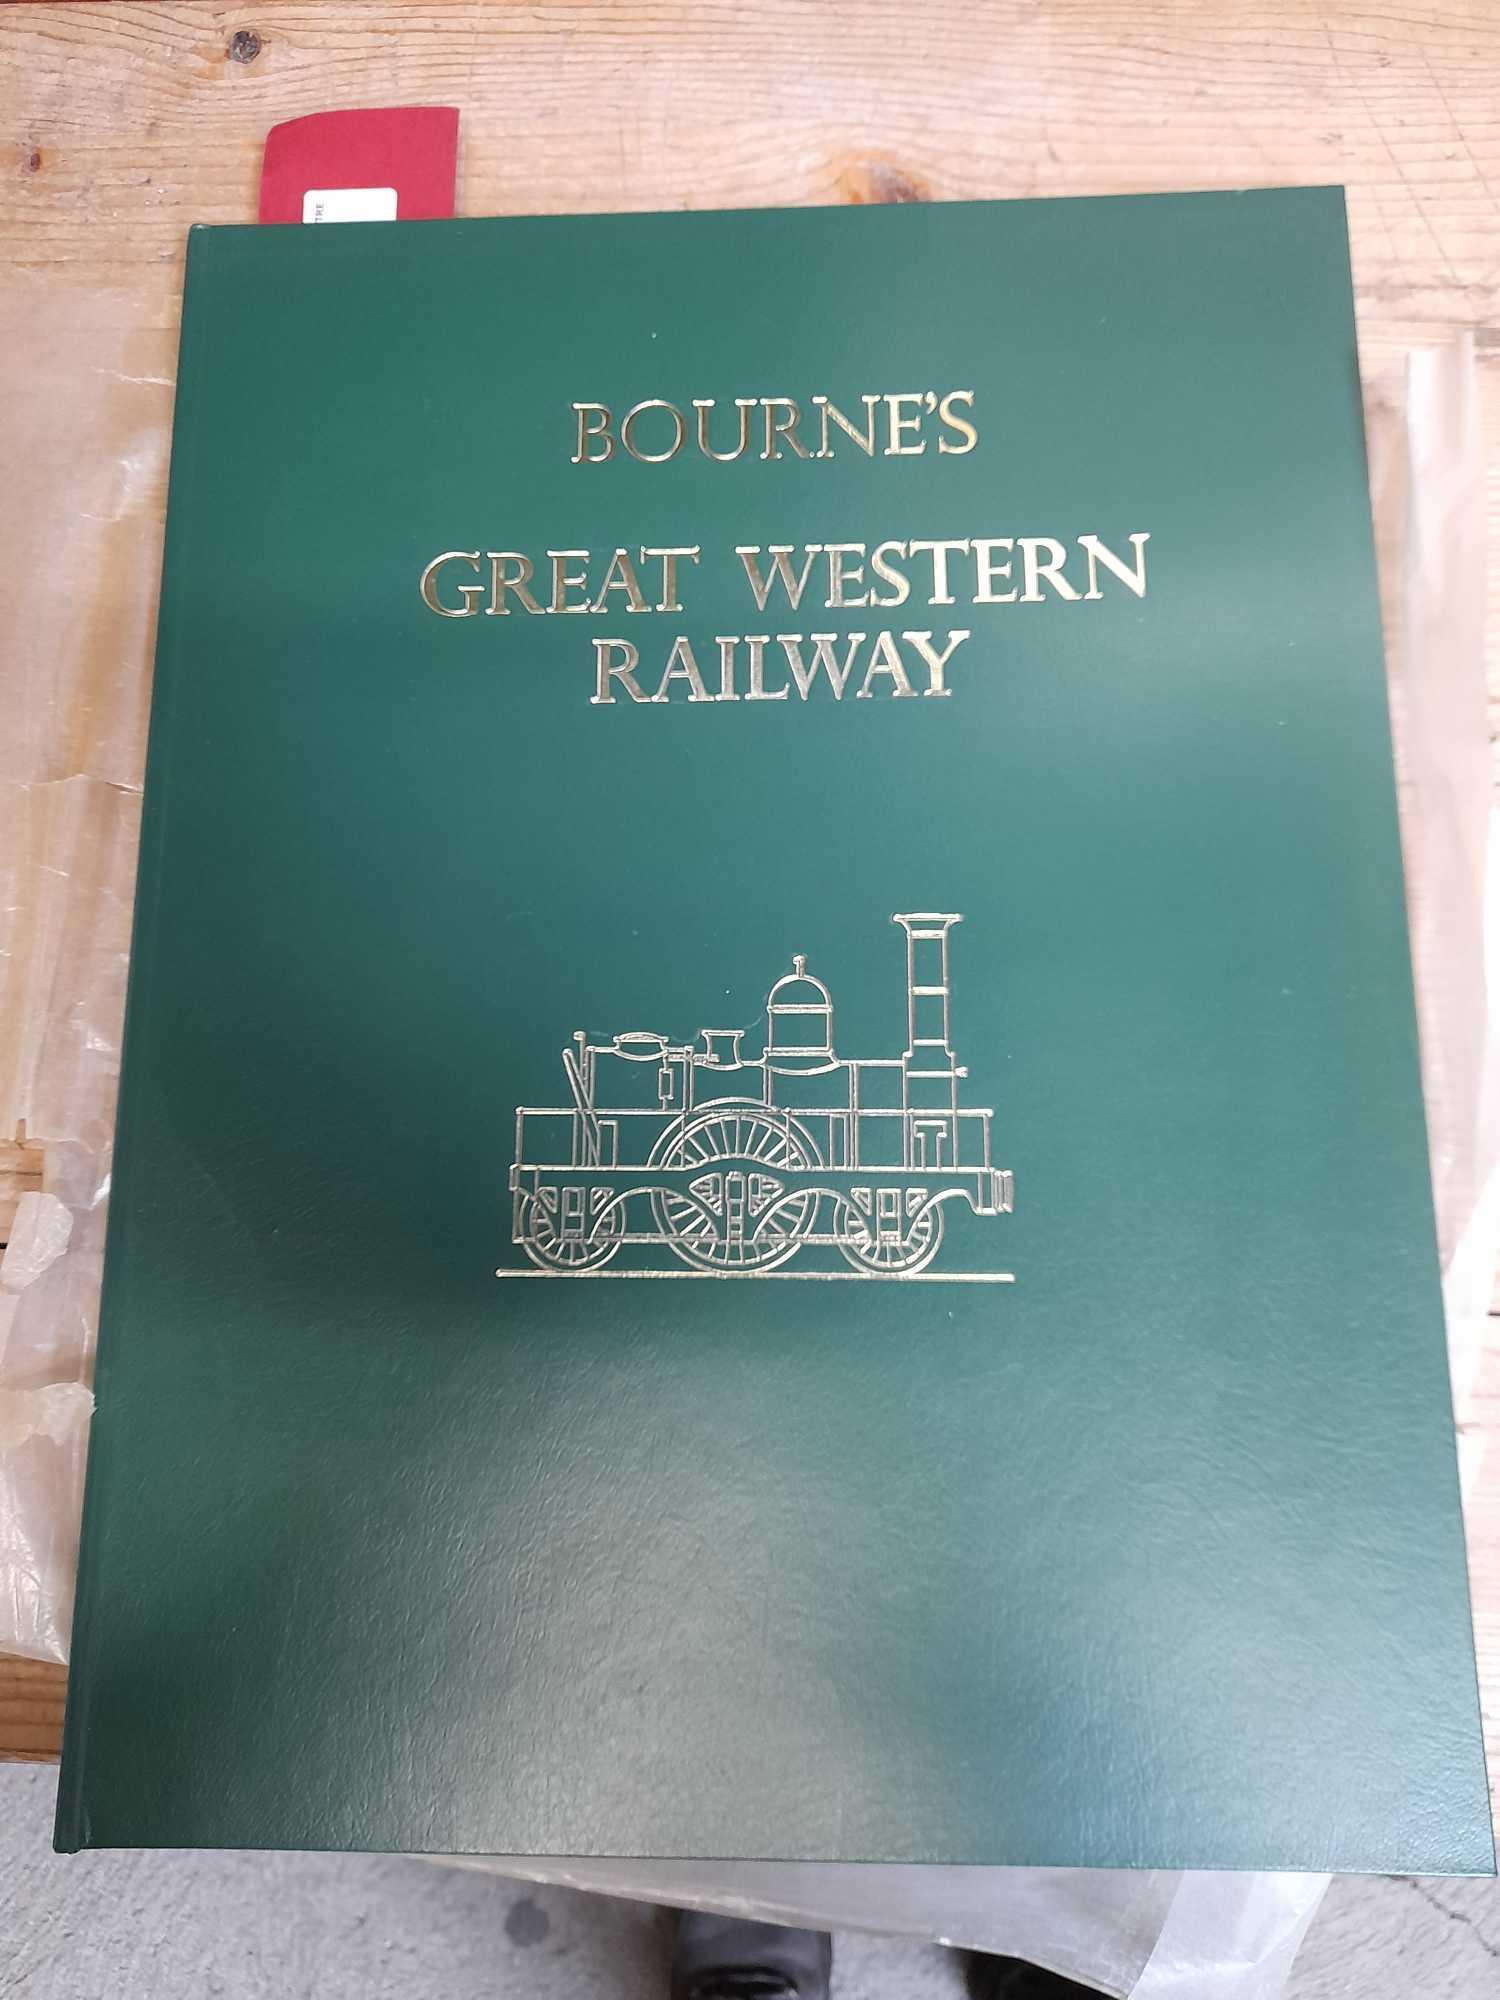 BOURNES GREAT WESTERN RAILWAY BOOK COPY 1 OF 500